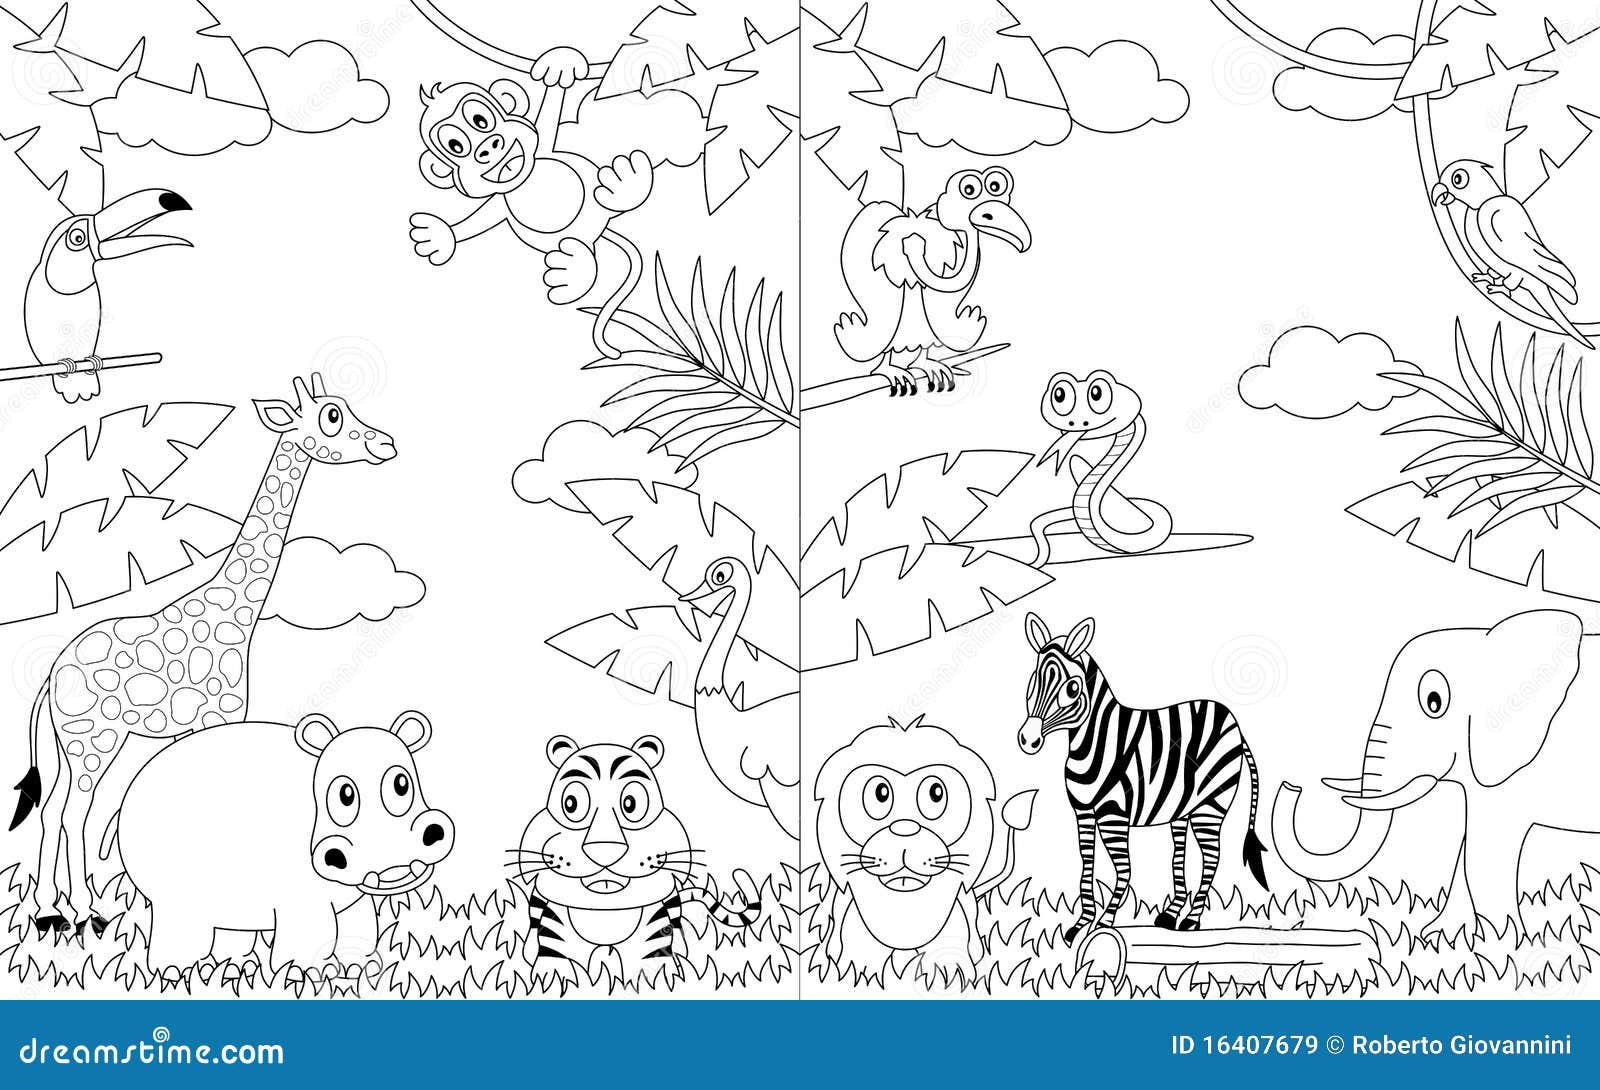 Wild Animals Coloring Pages also Aeroporto Tarry Town Disegno Da Colorare Gratis furthermore Stock Photo Africa Continent Kids Map Coloring moreover Desenhos Do Egito Antigo together with P C3 A1ginas De Colorir Animais Pequeno Linda Alligator Gm540736922 96606347. on africa coloring pages o